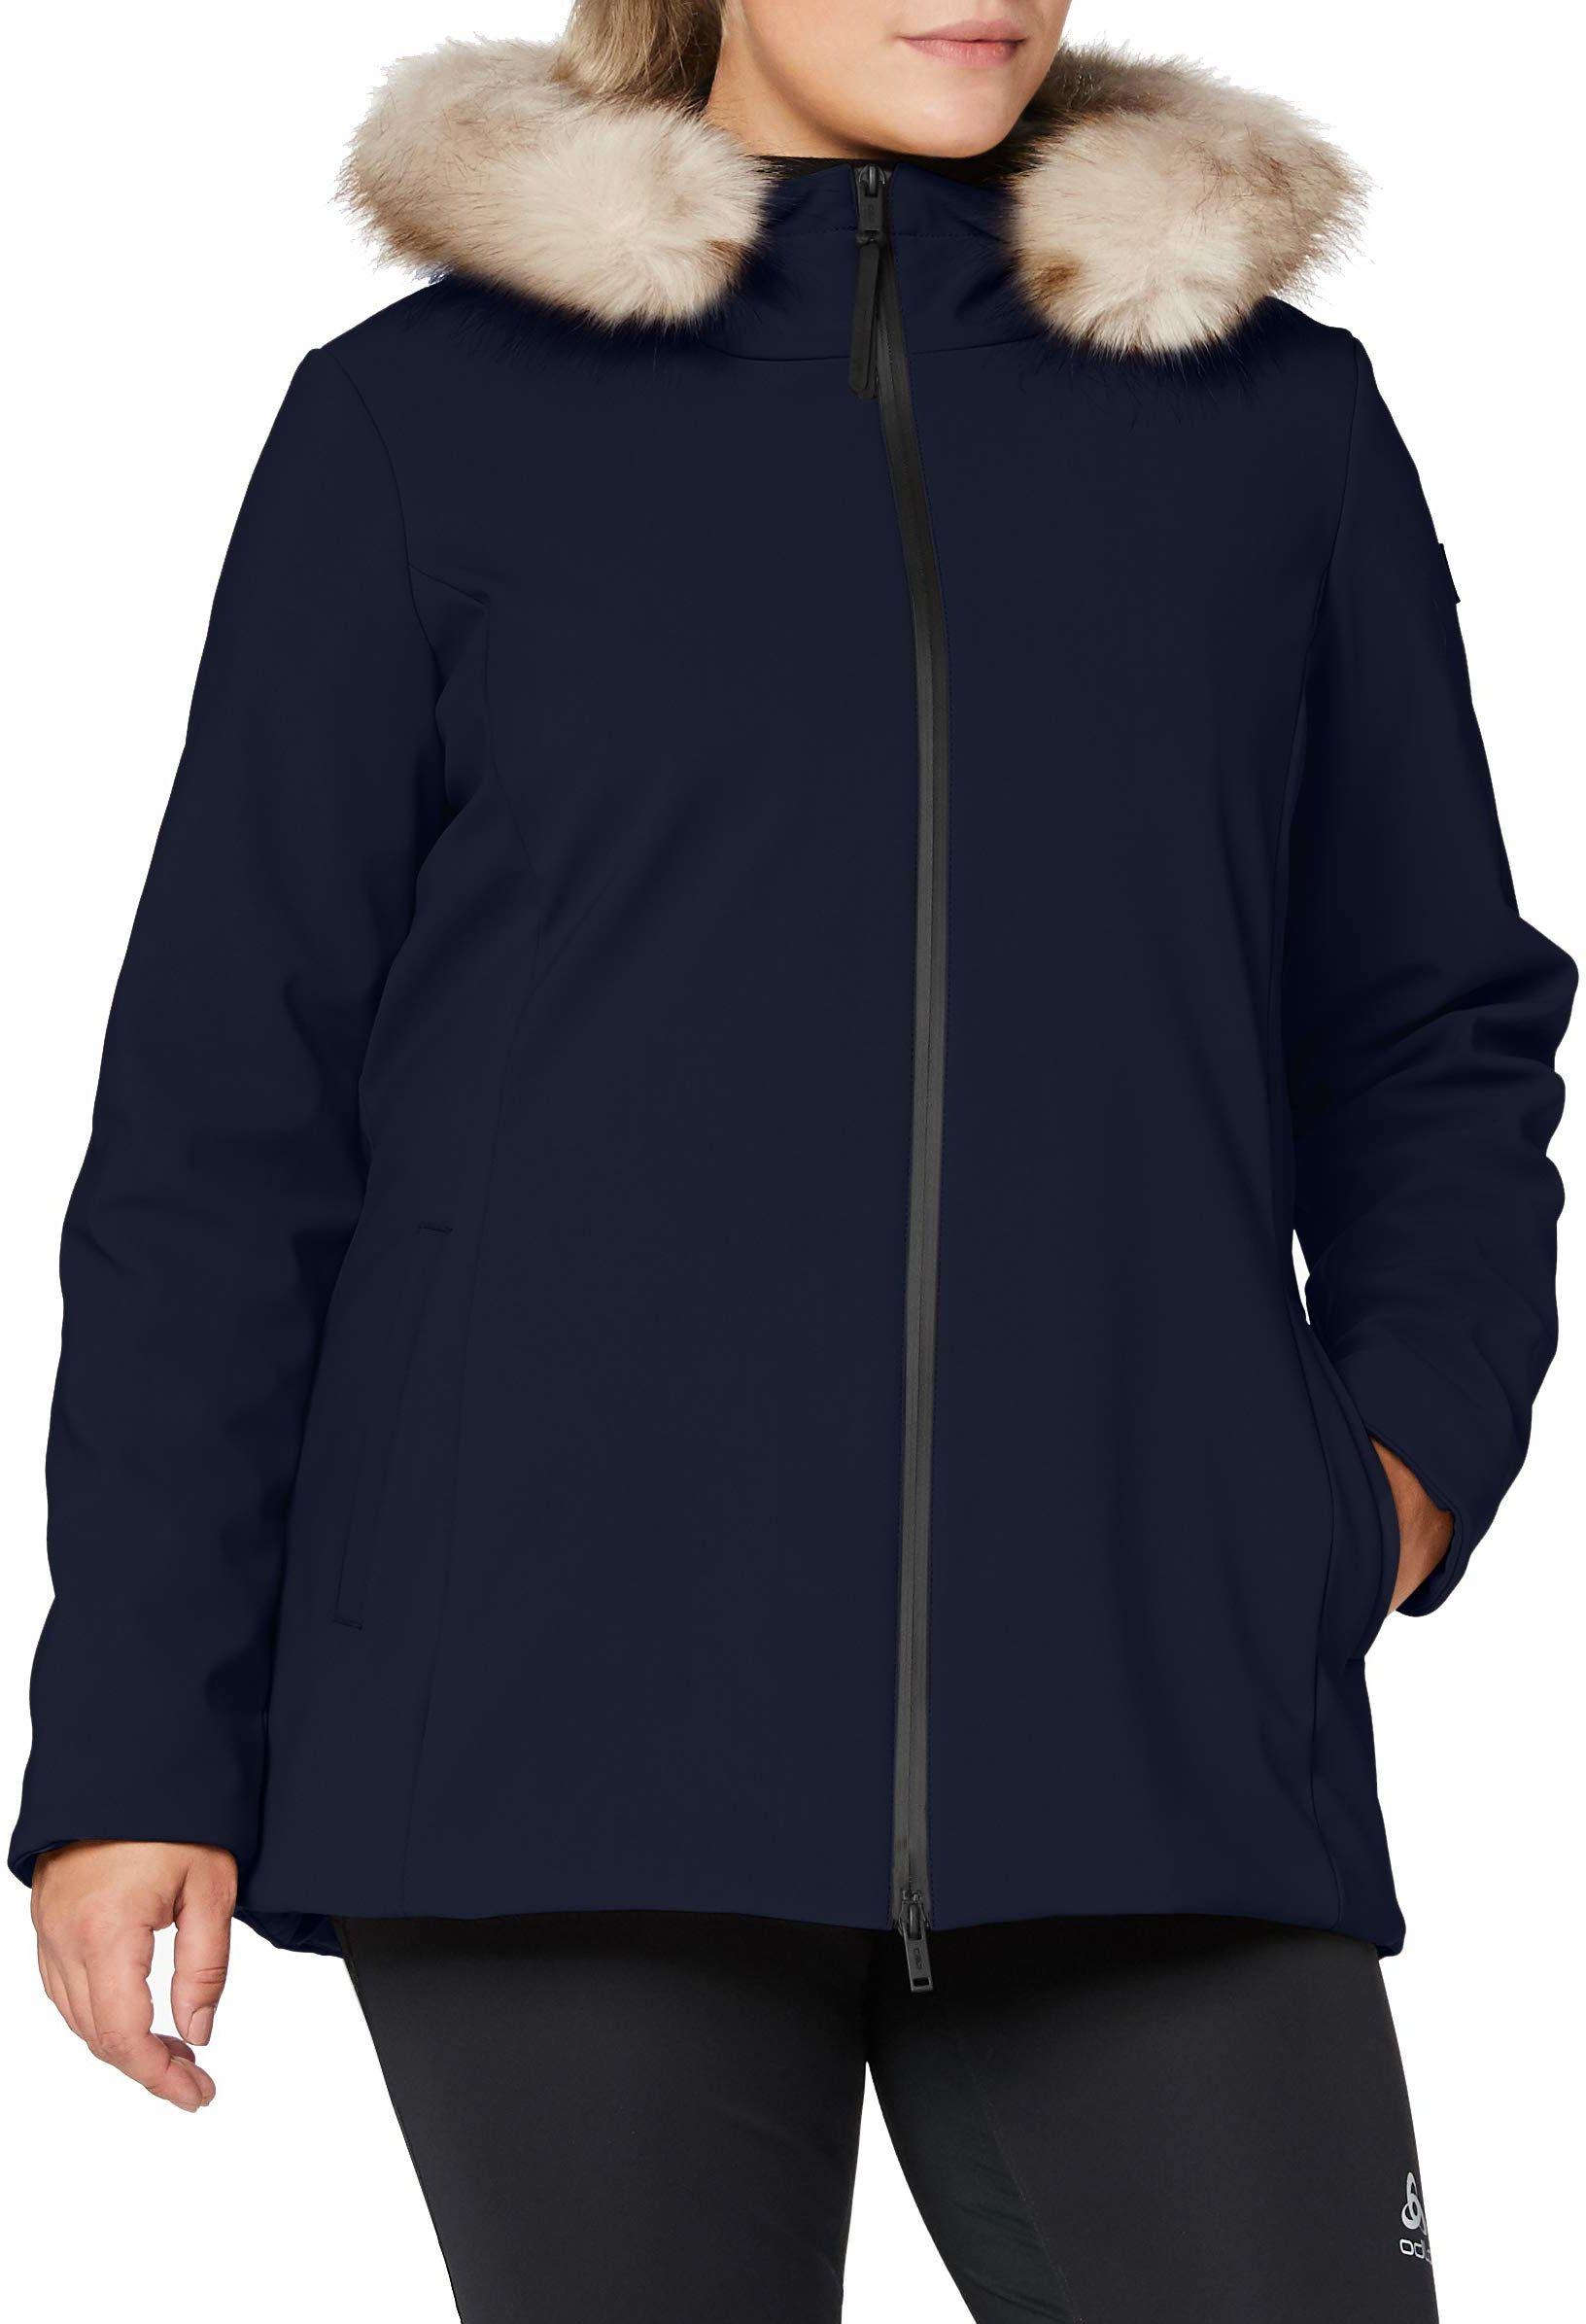 CMP Damska parka Softshell Imbottito Con Cappuccio Eco Fur kurtka niebieski czarny i niebieski 42